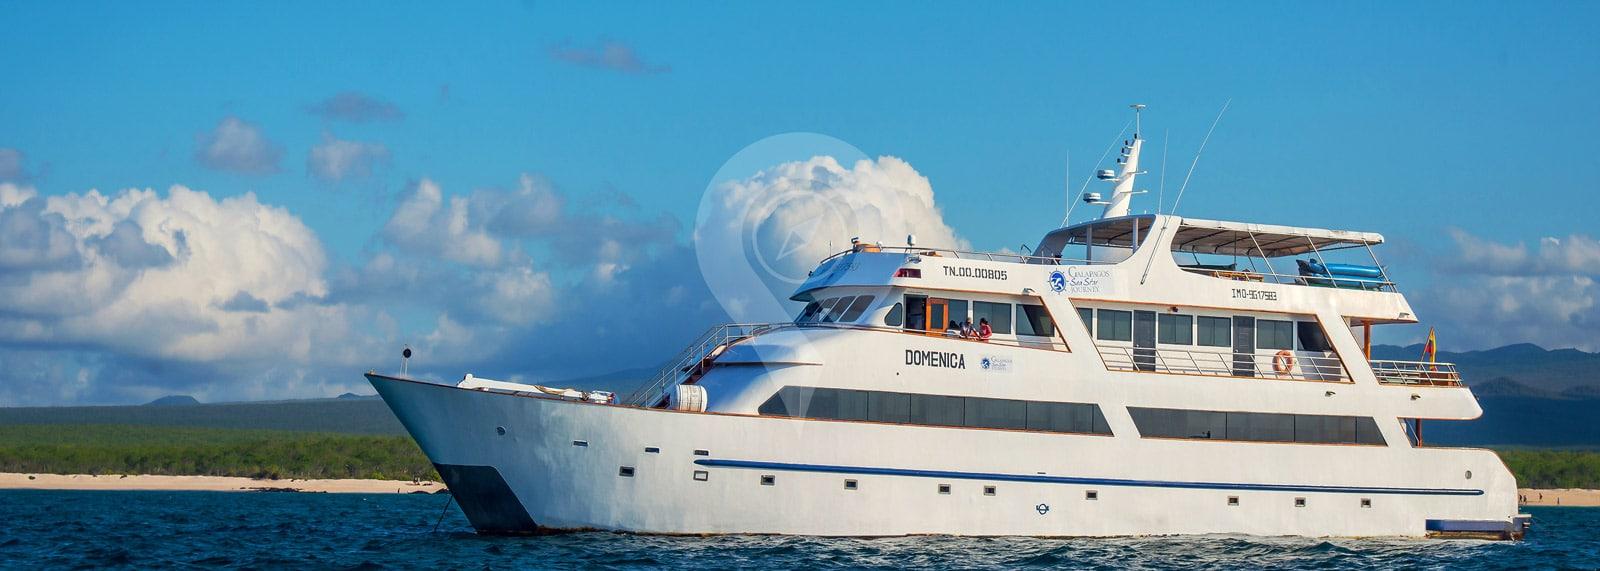 Galapagos Sea Star Journey Yacht